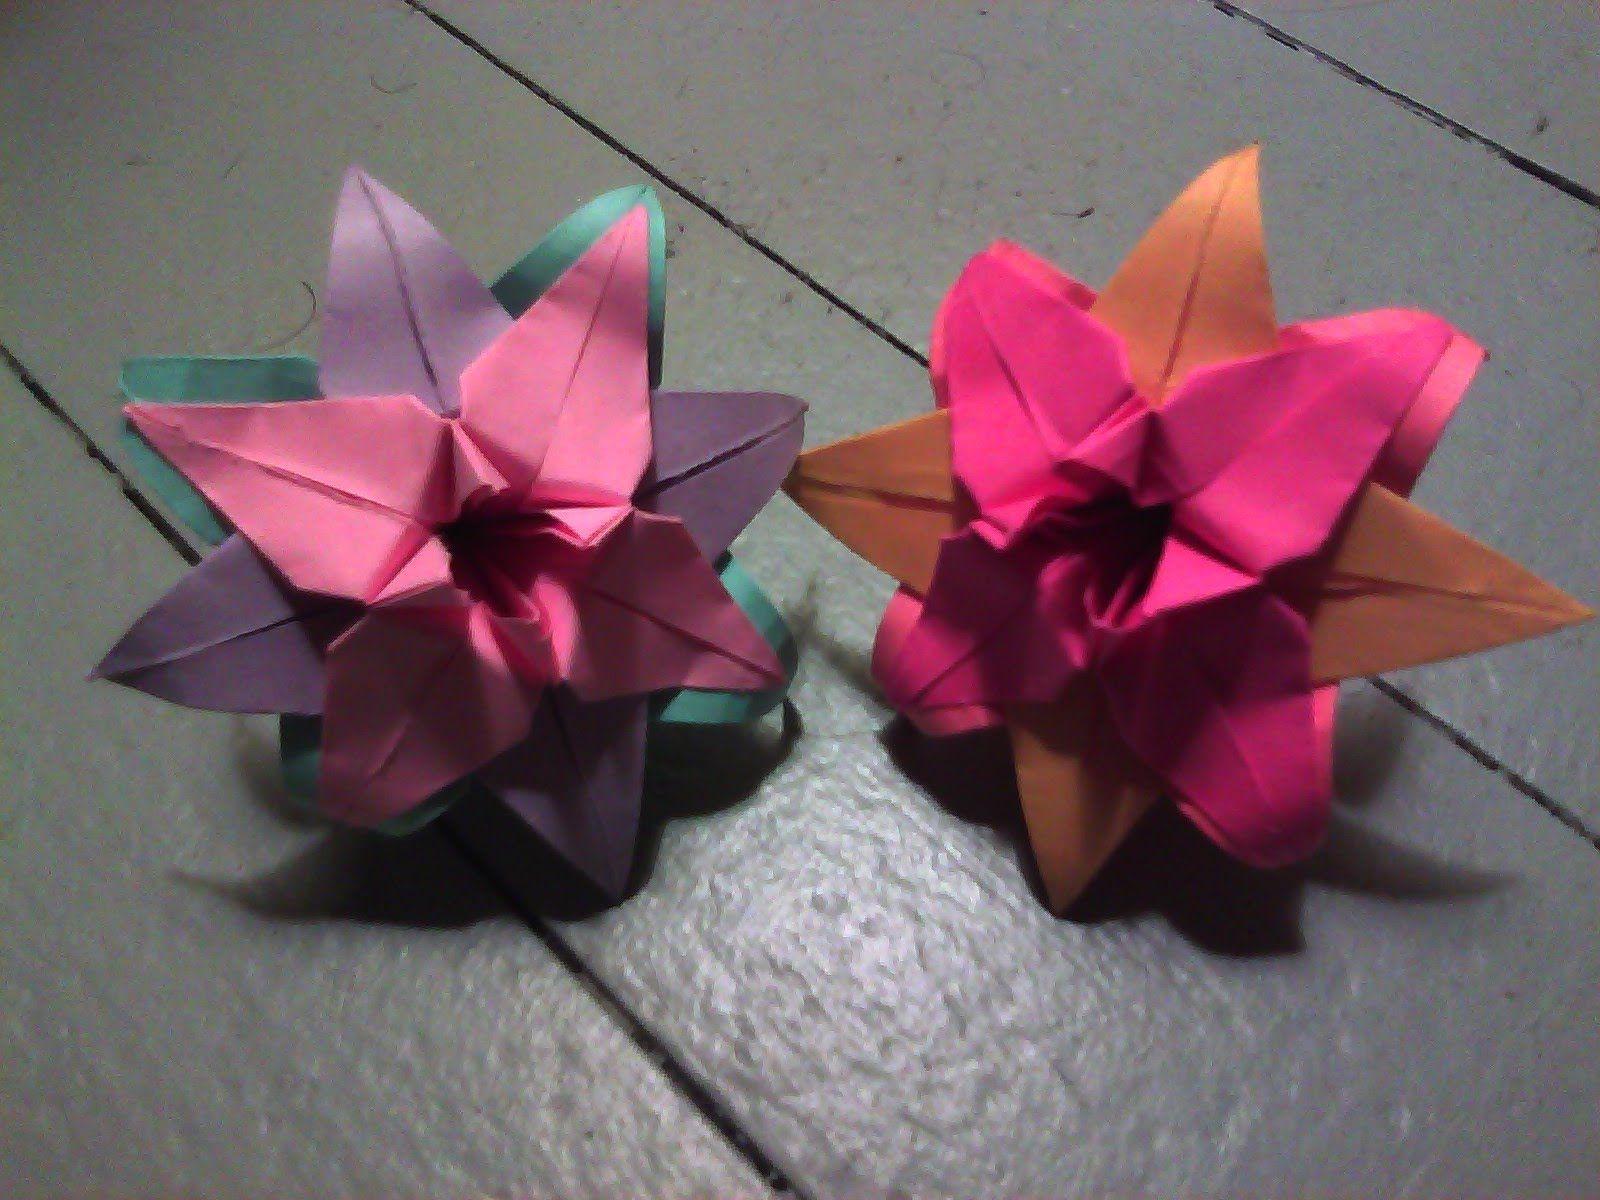 Tricolored origami lily origami flowers pinterest origami how to fold a tricolored origami lily izmirmasajfo